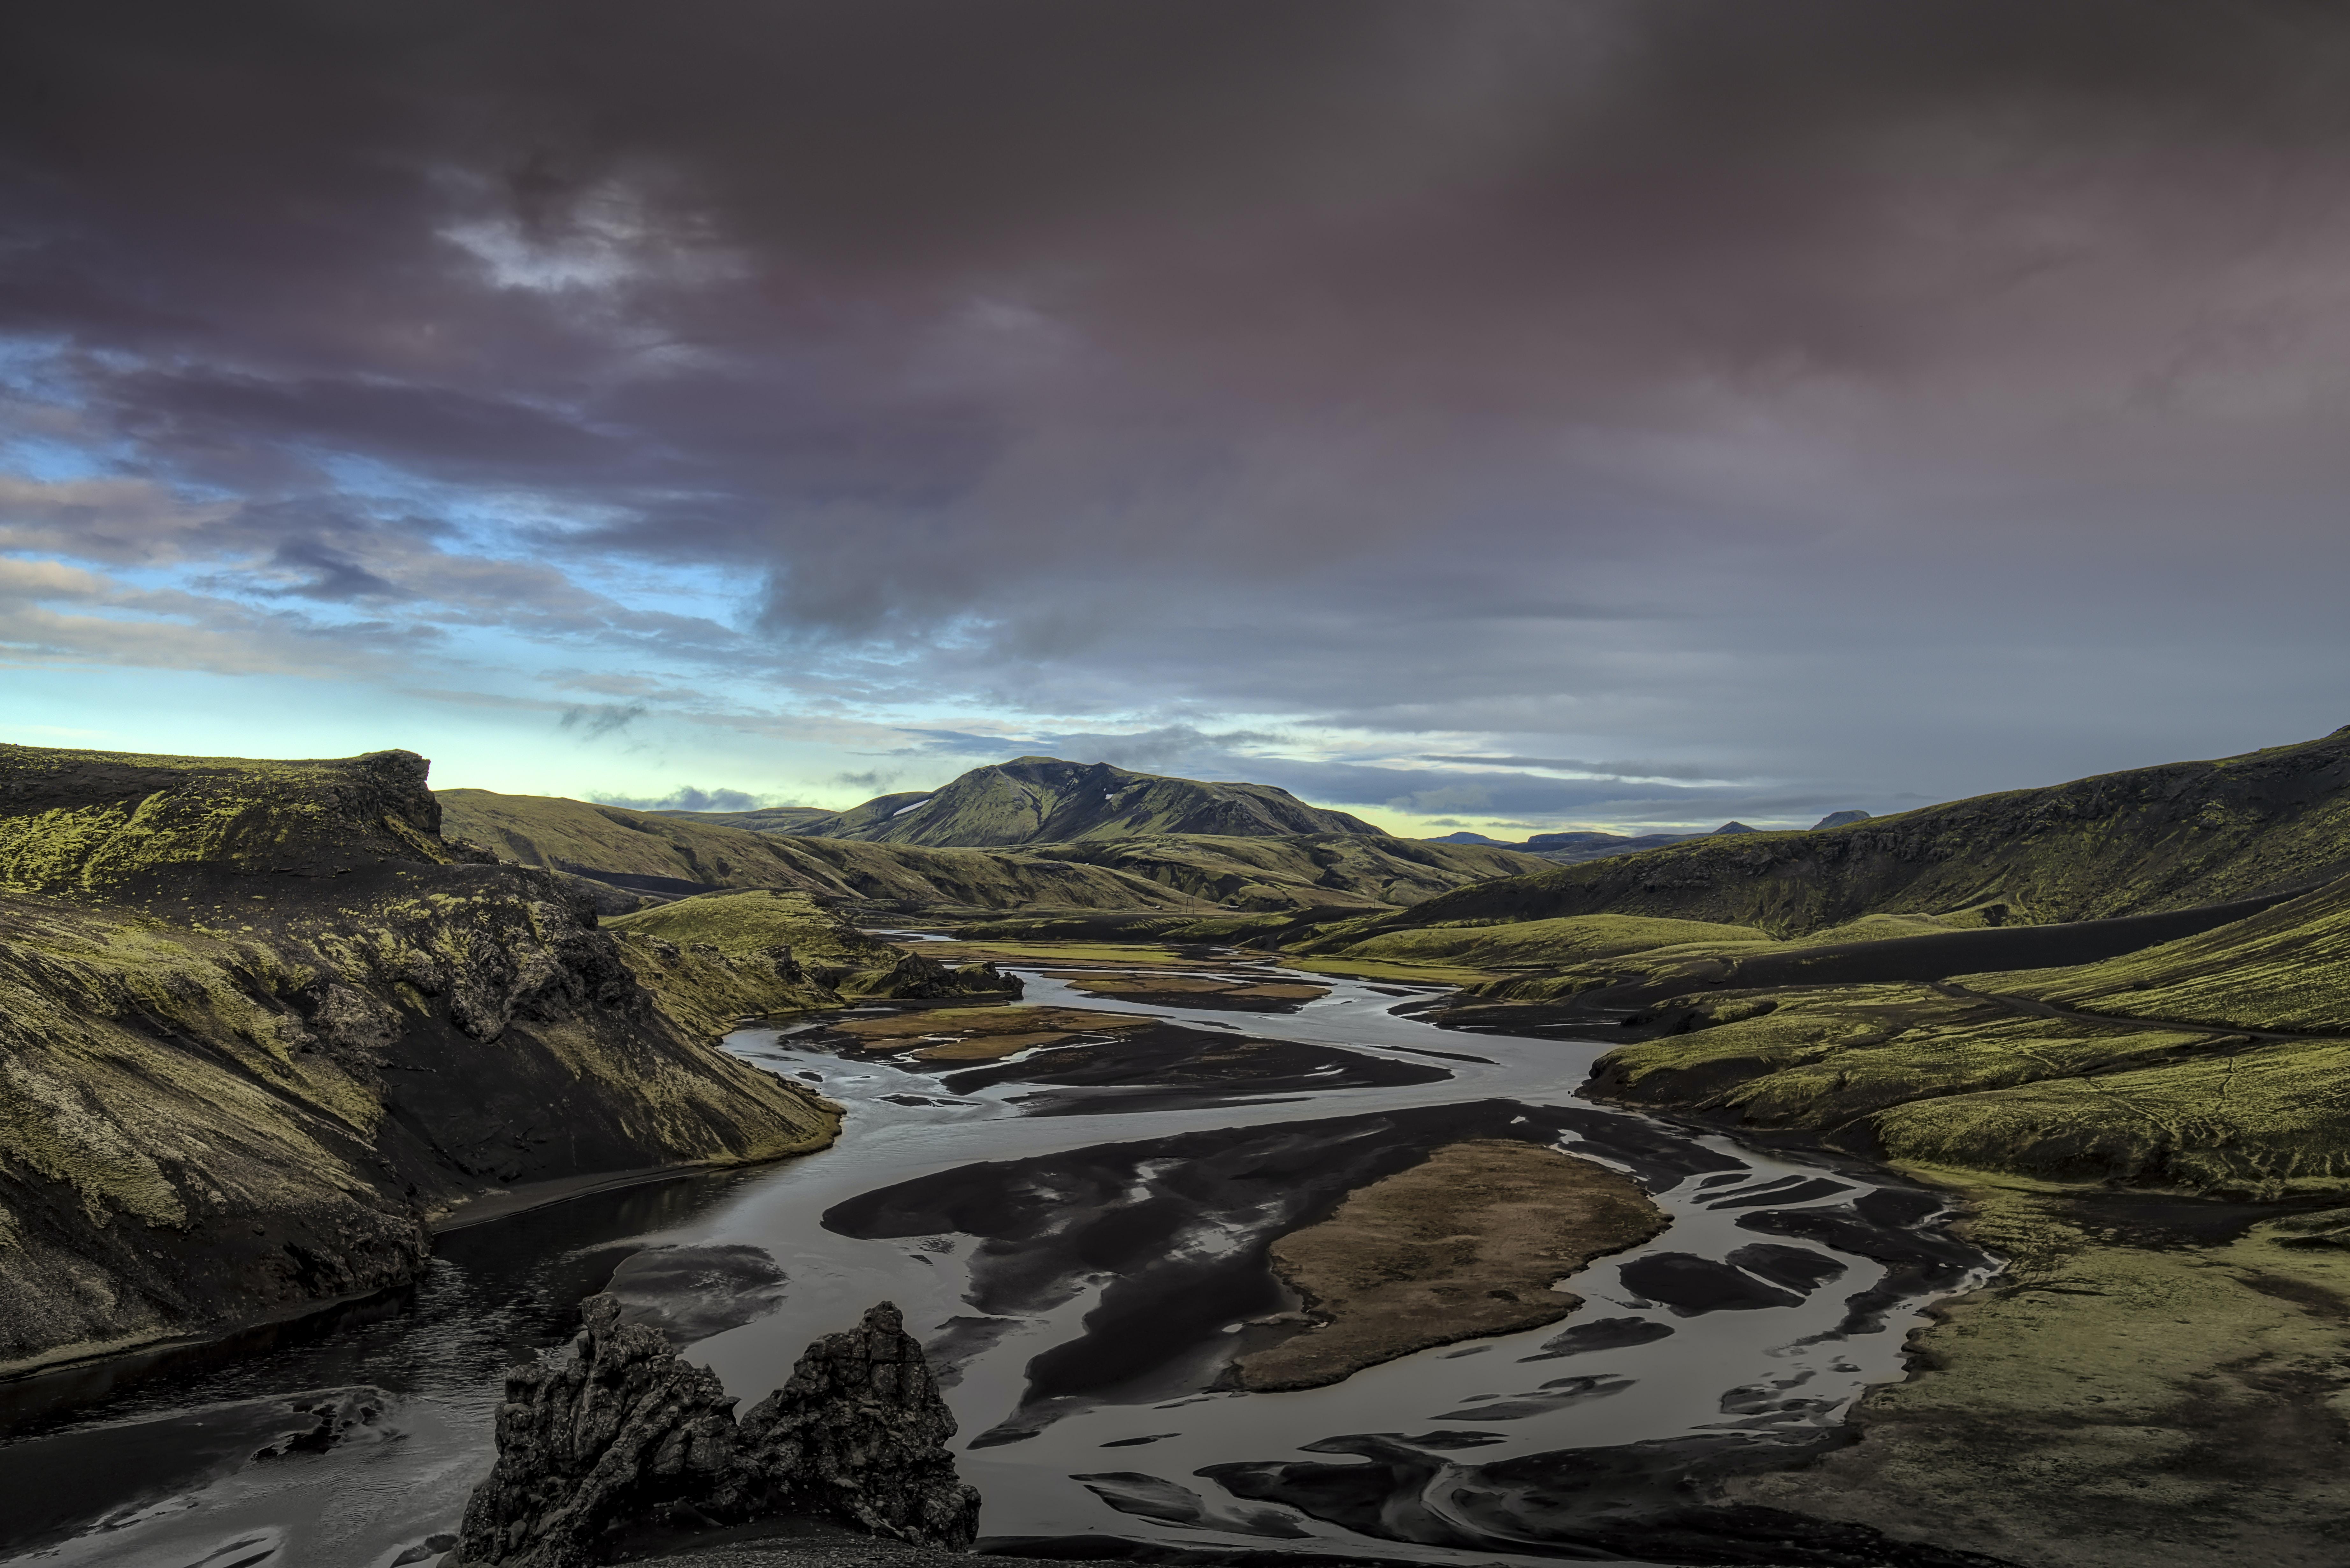 river near mountain landscape photography